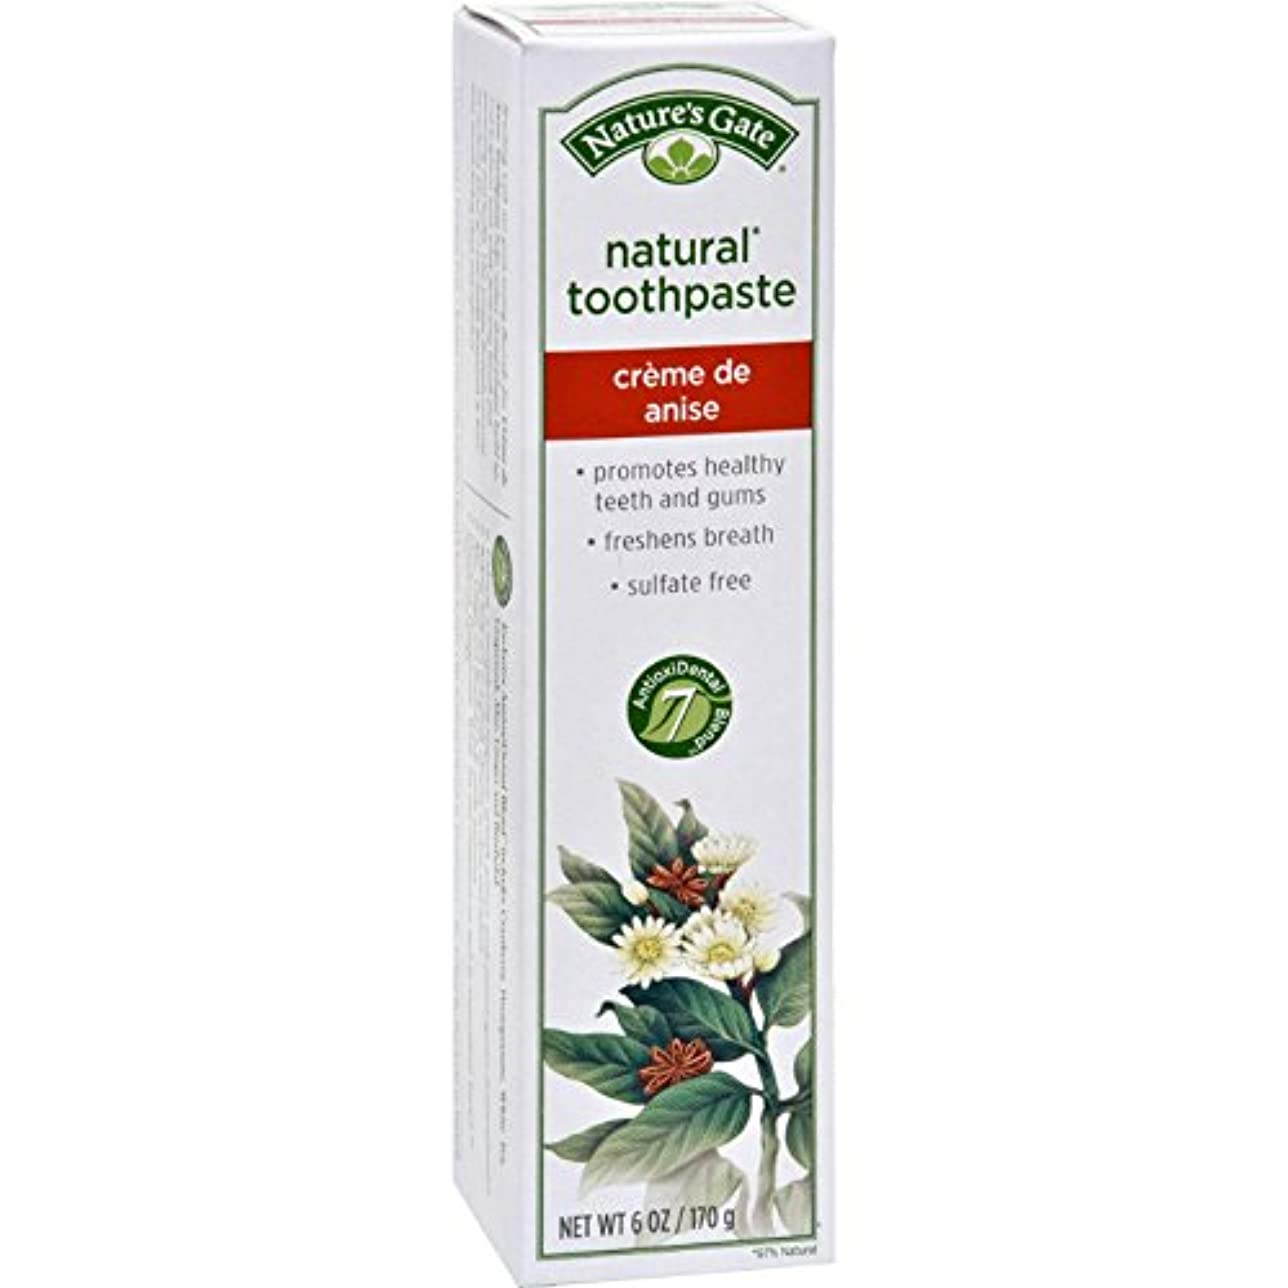 靄十赤字海外直送品Toothpaste Creme De, Anise 6 Oz by Nature's Gate